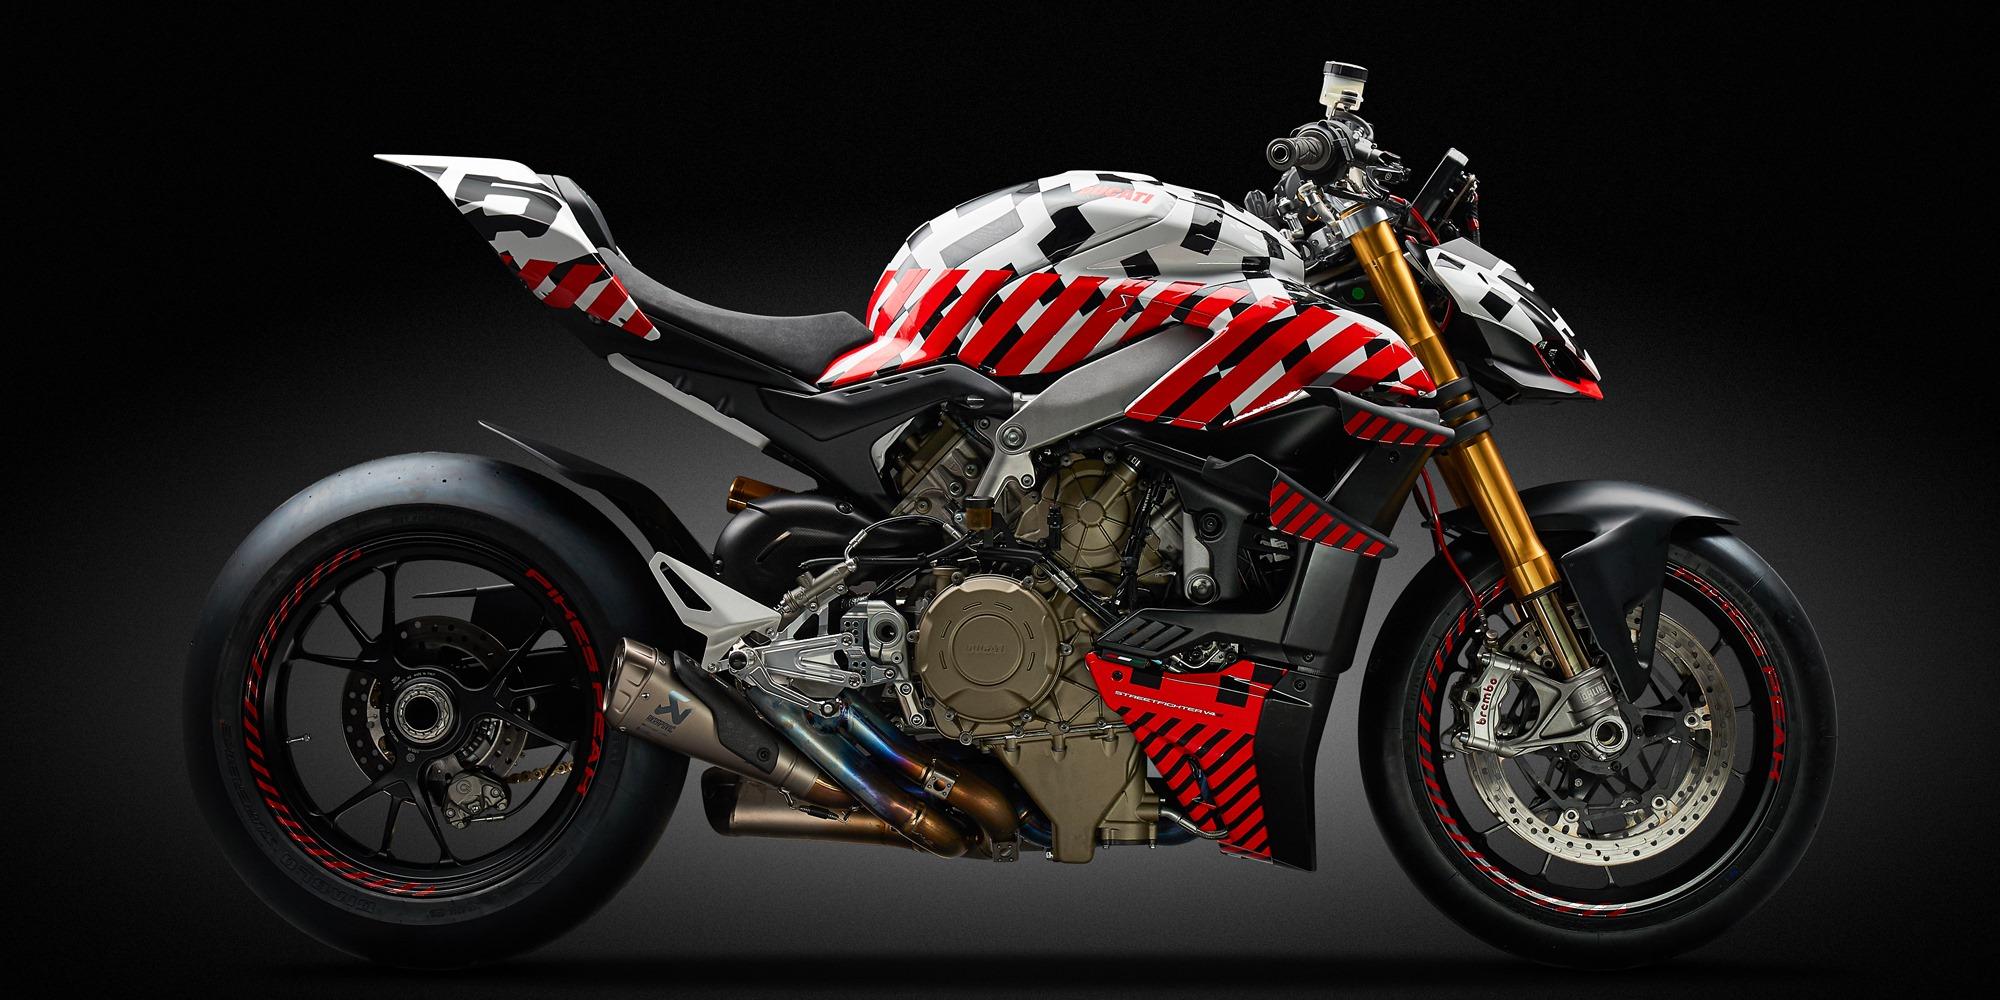 A Ducati em Pikes Peak com a Streetfighter V4